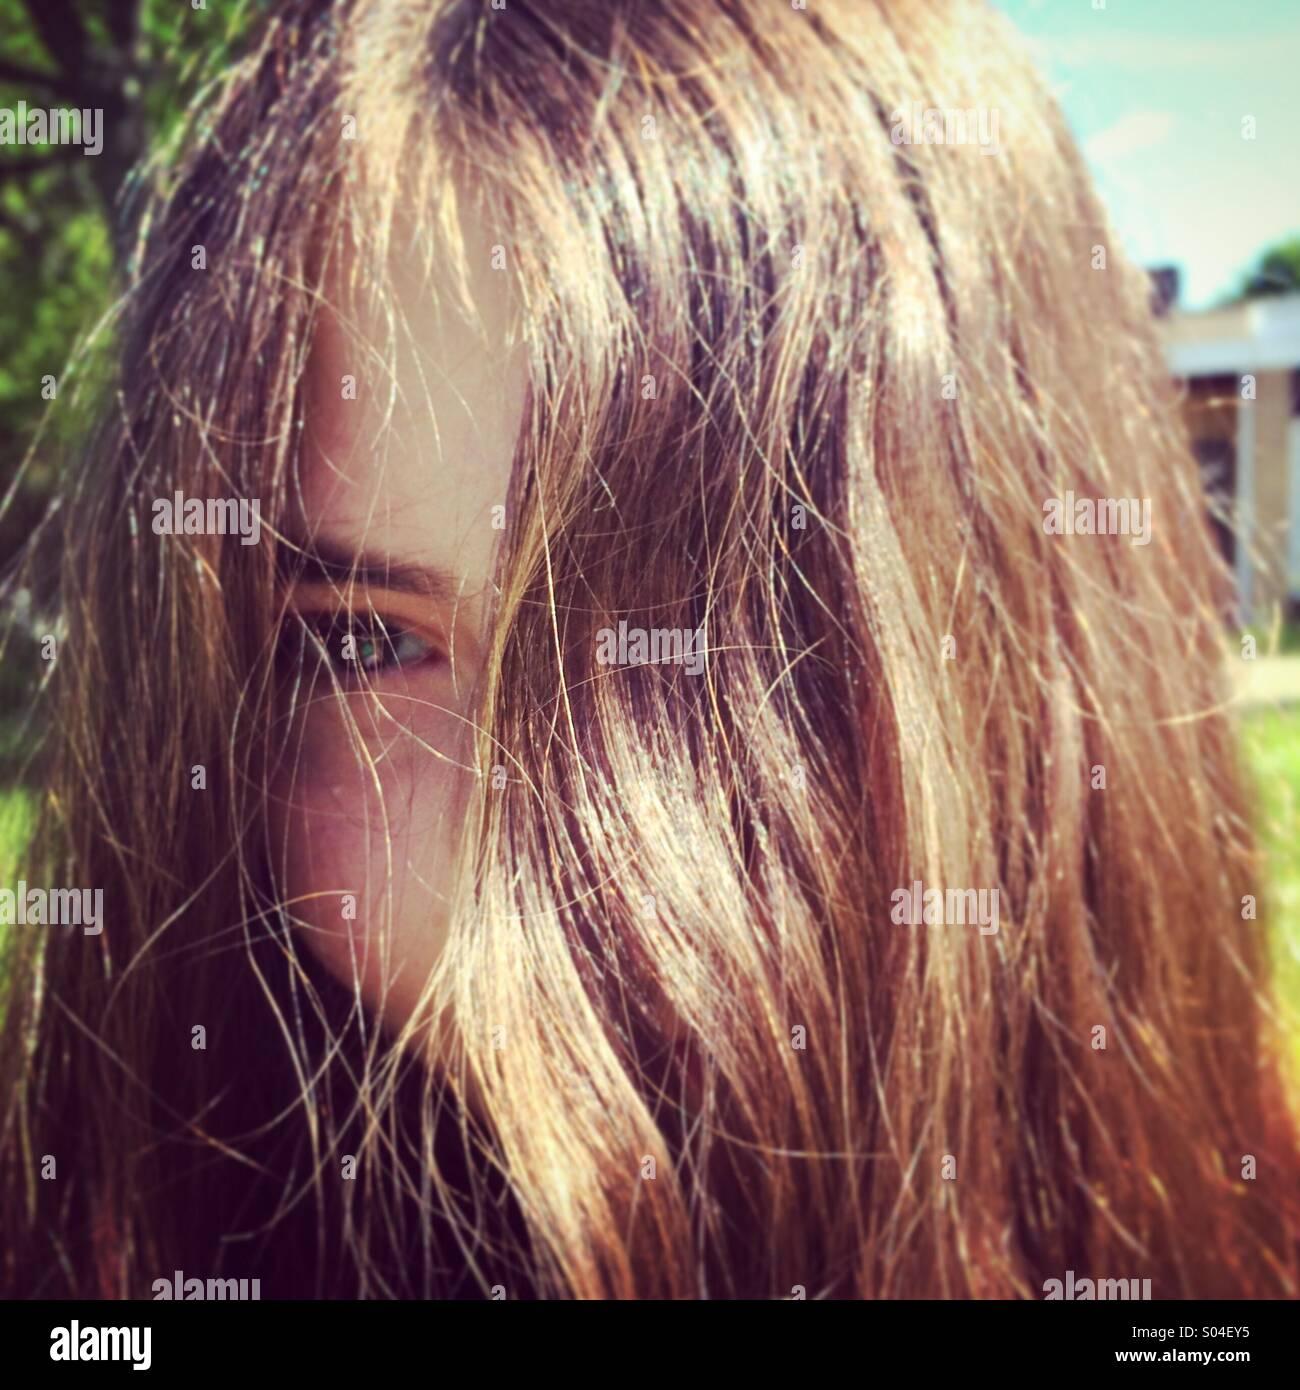 Peinado Imagen De Stock